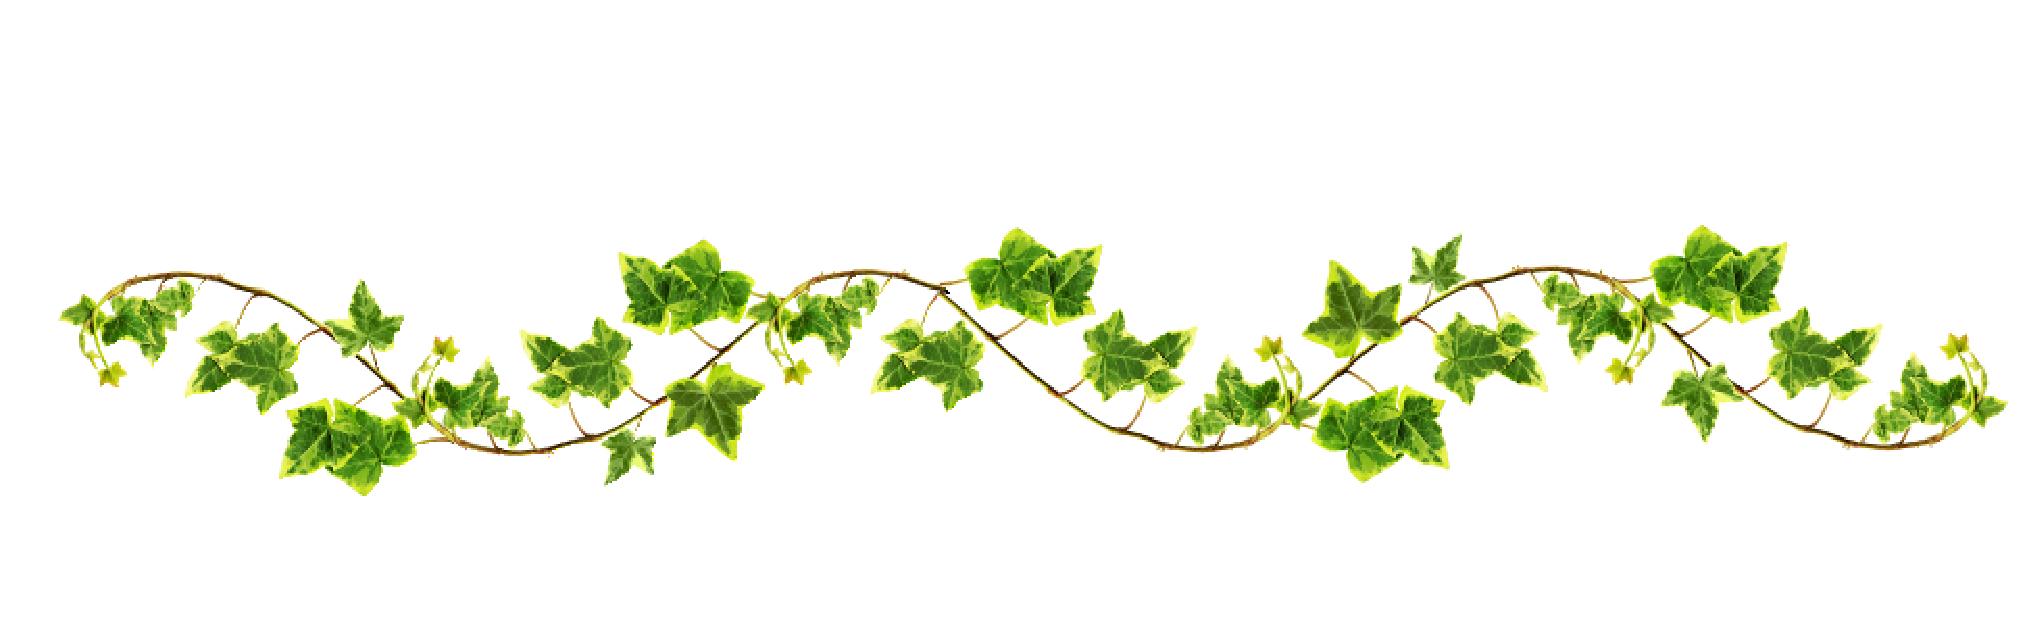 Vines clipart green. Devotional